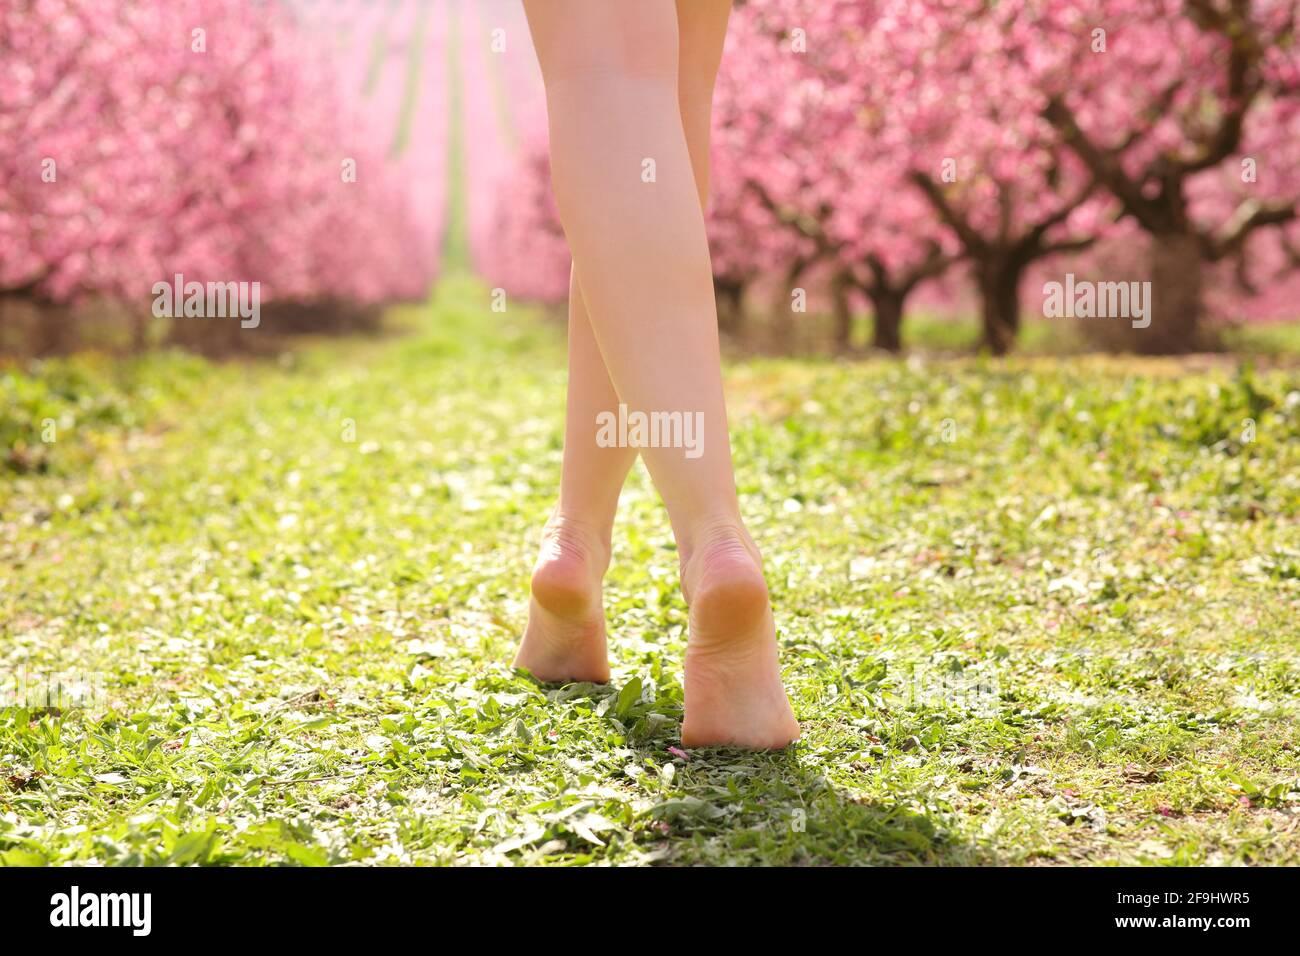 Back view portrait of a beautiful woman waxed legs walking across a pink flowered field in spring season Stock Photo